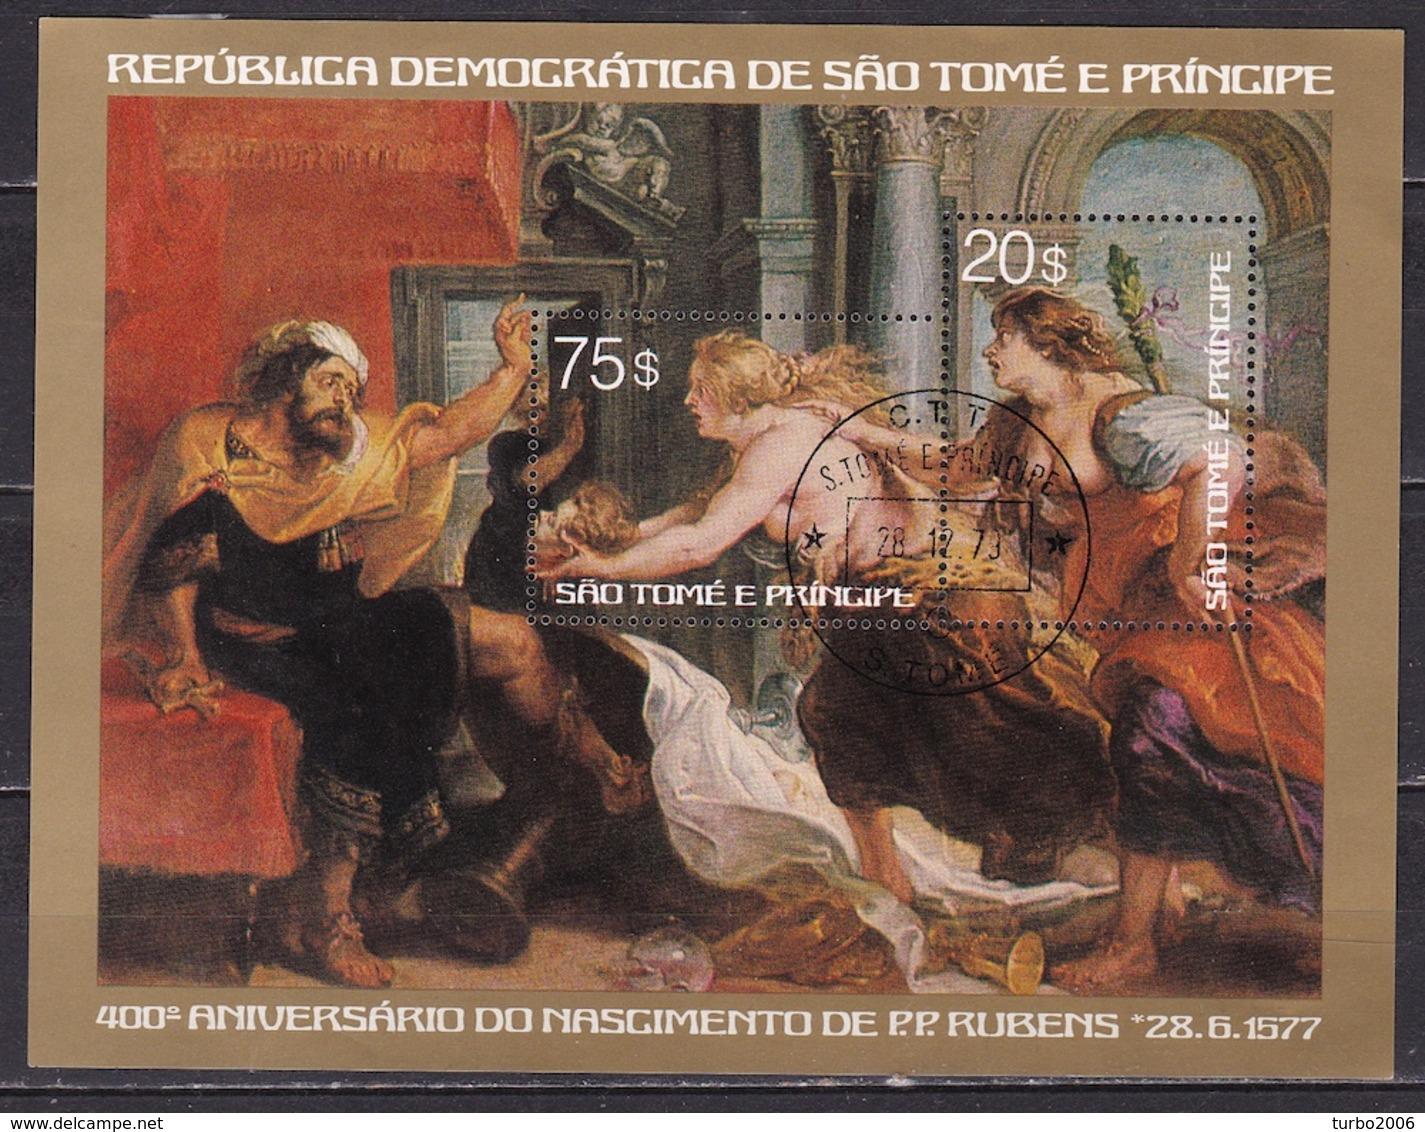 1979 Sao Tomé E Principe 400 Years P.P. Rubens Block With Stamps $ 20-75 - Sao Tome En Principe